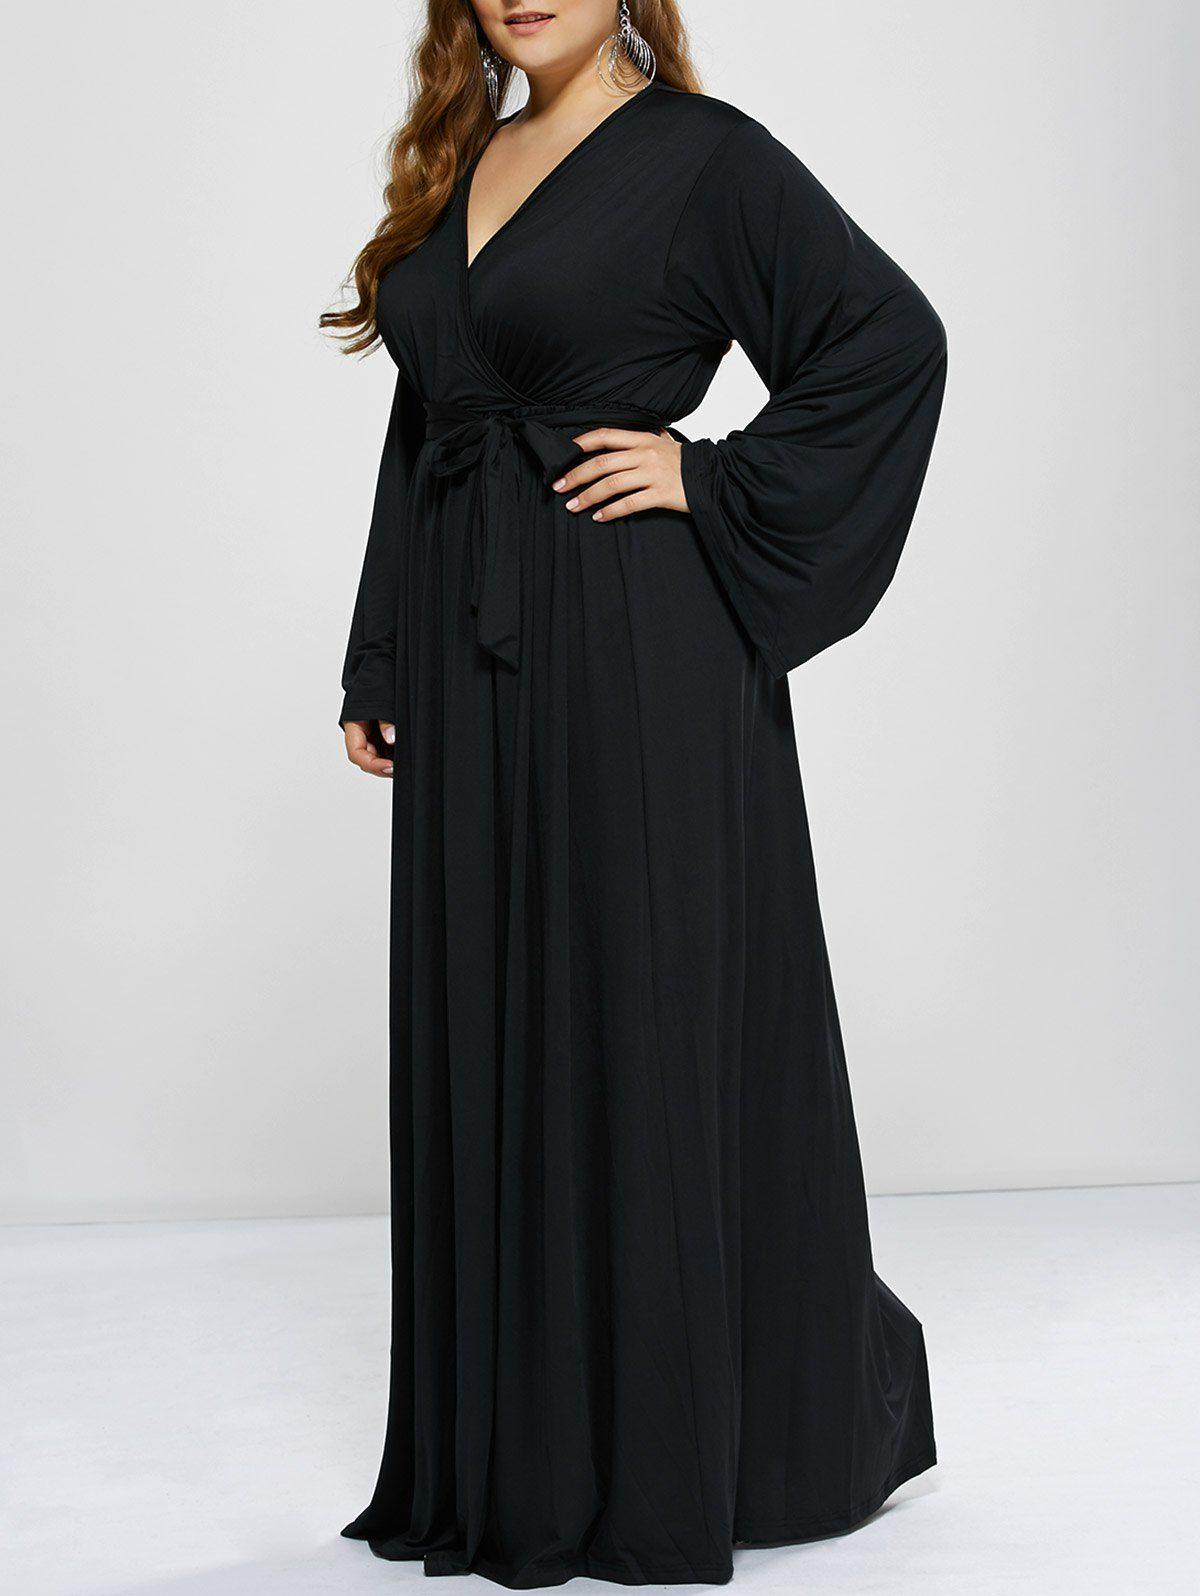 Plus Size Long Sleeve Modest Maxi Formal Dress Plus size